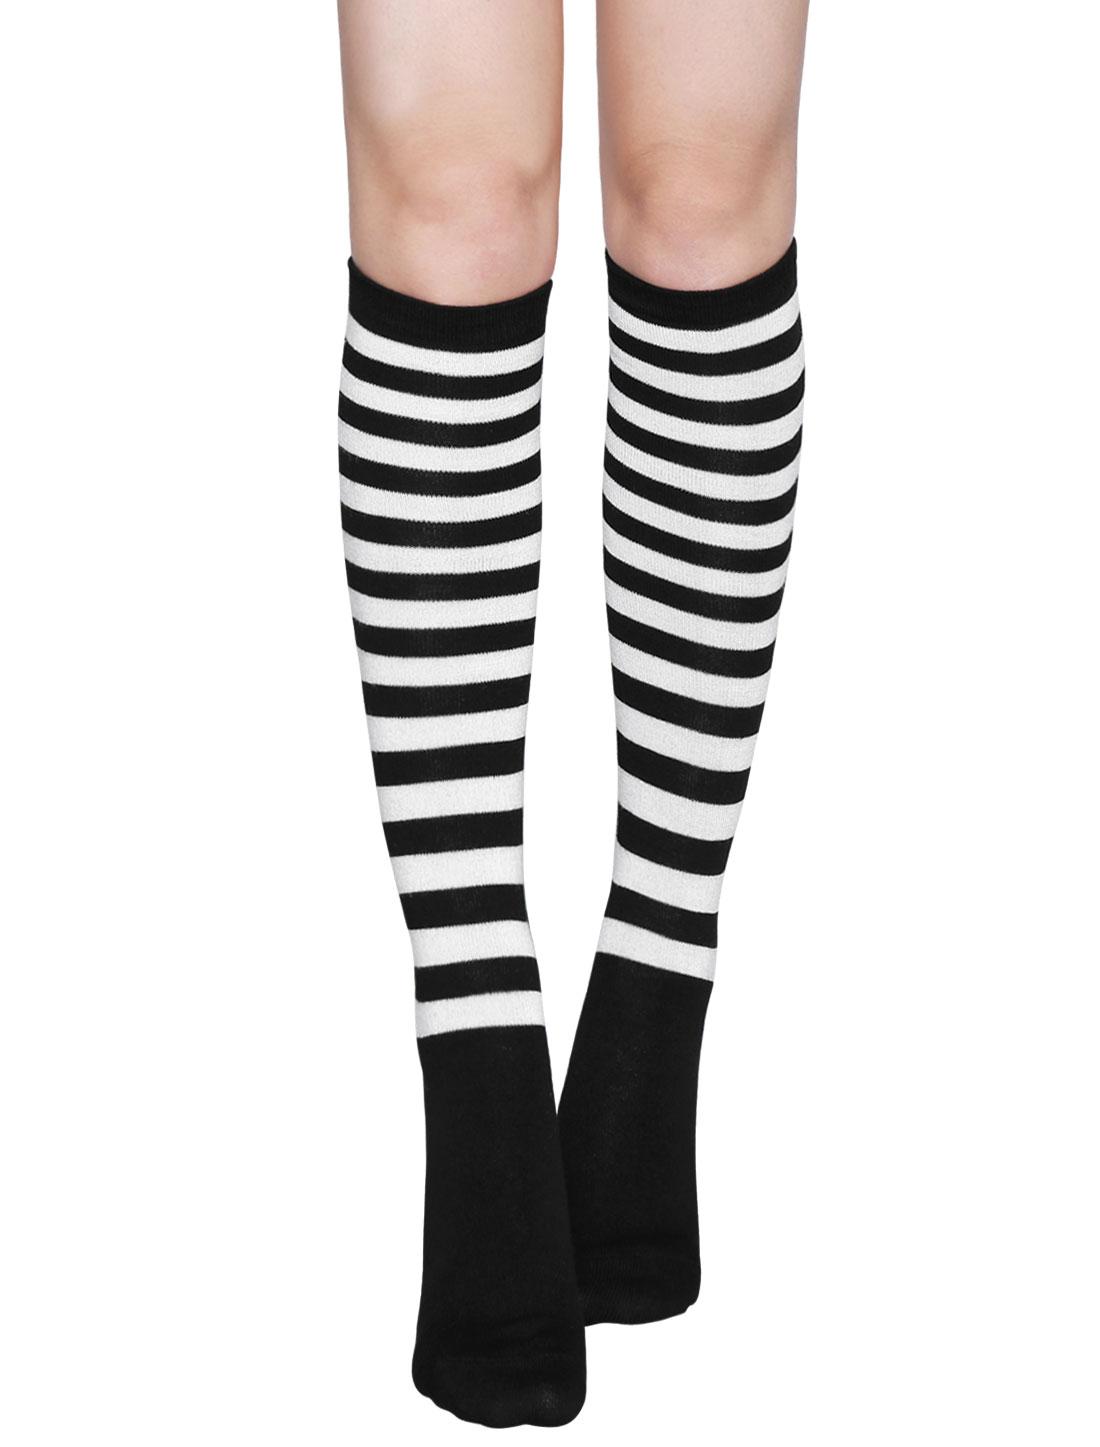 Ladies Stripes Contrast Color Knee High Socks Pair White